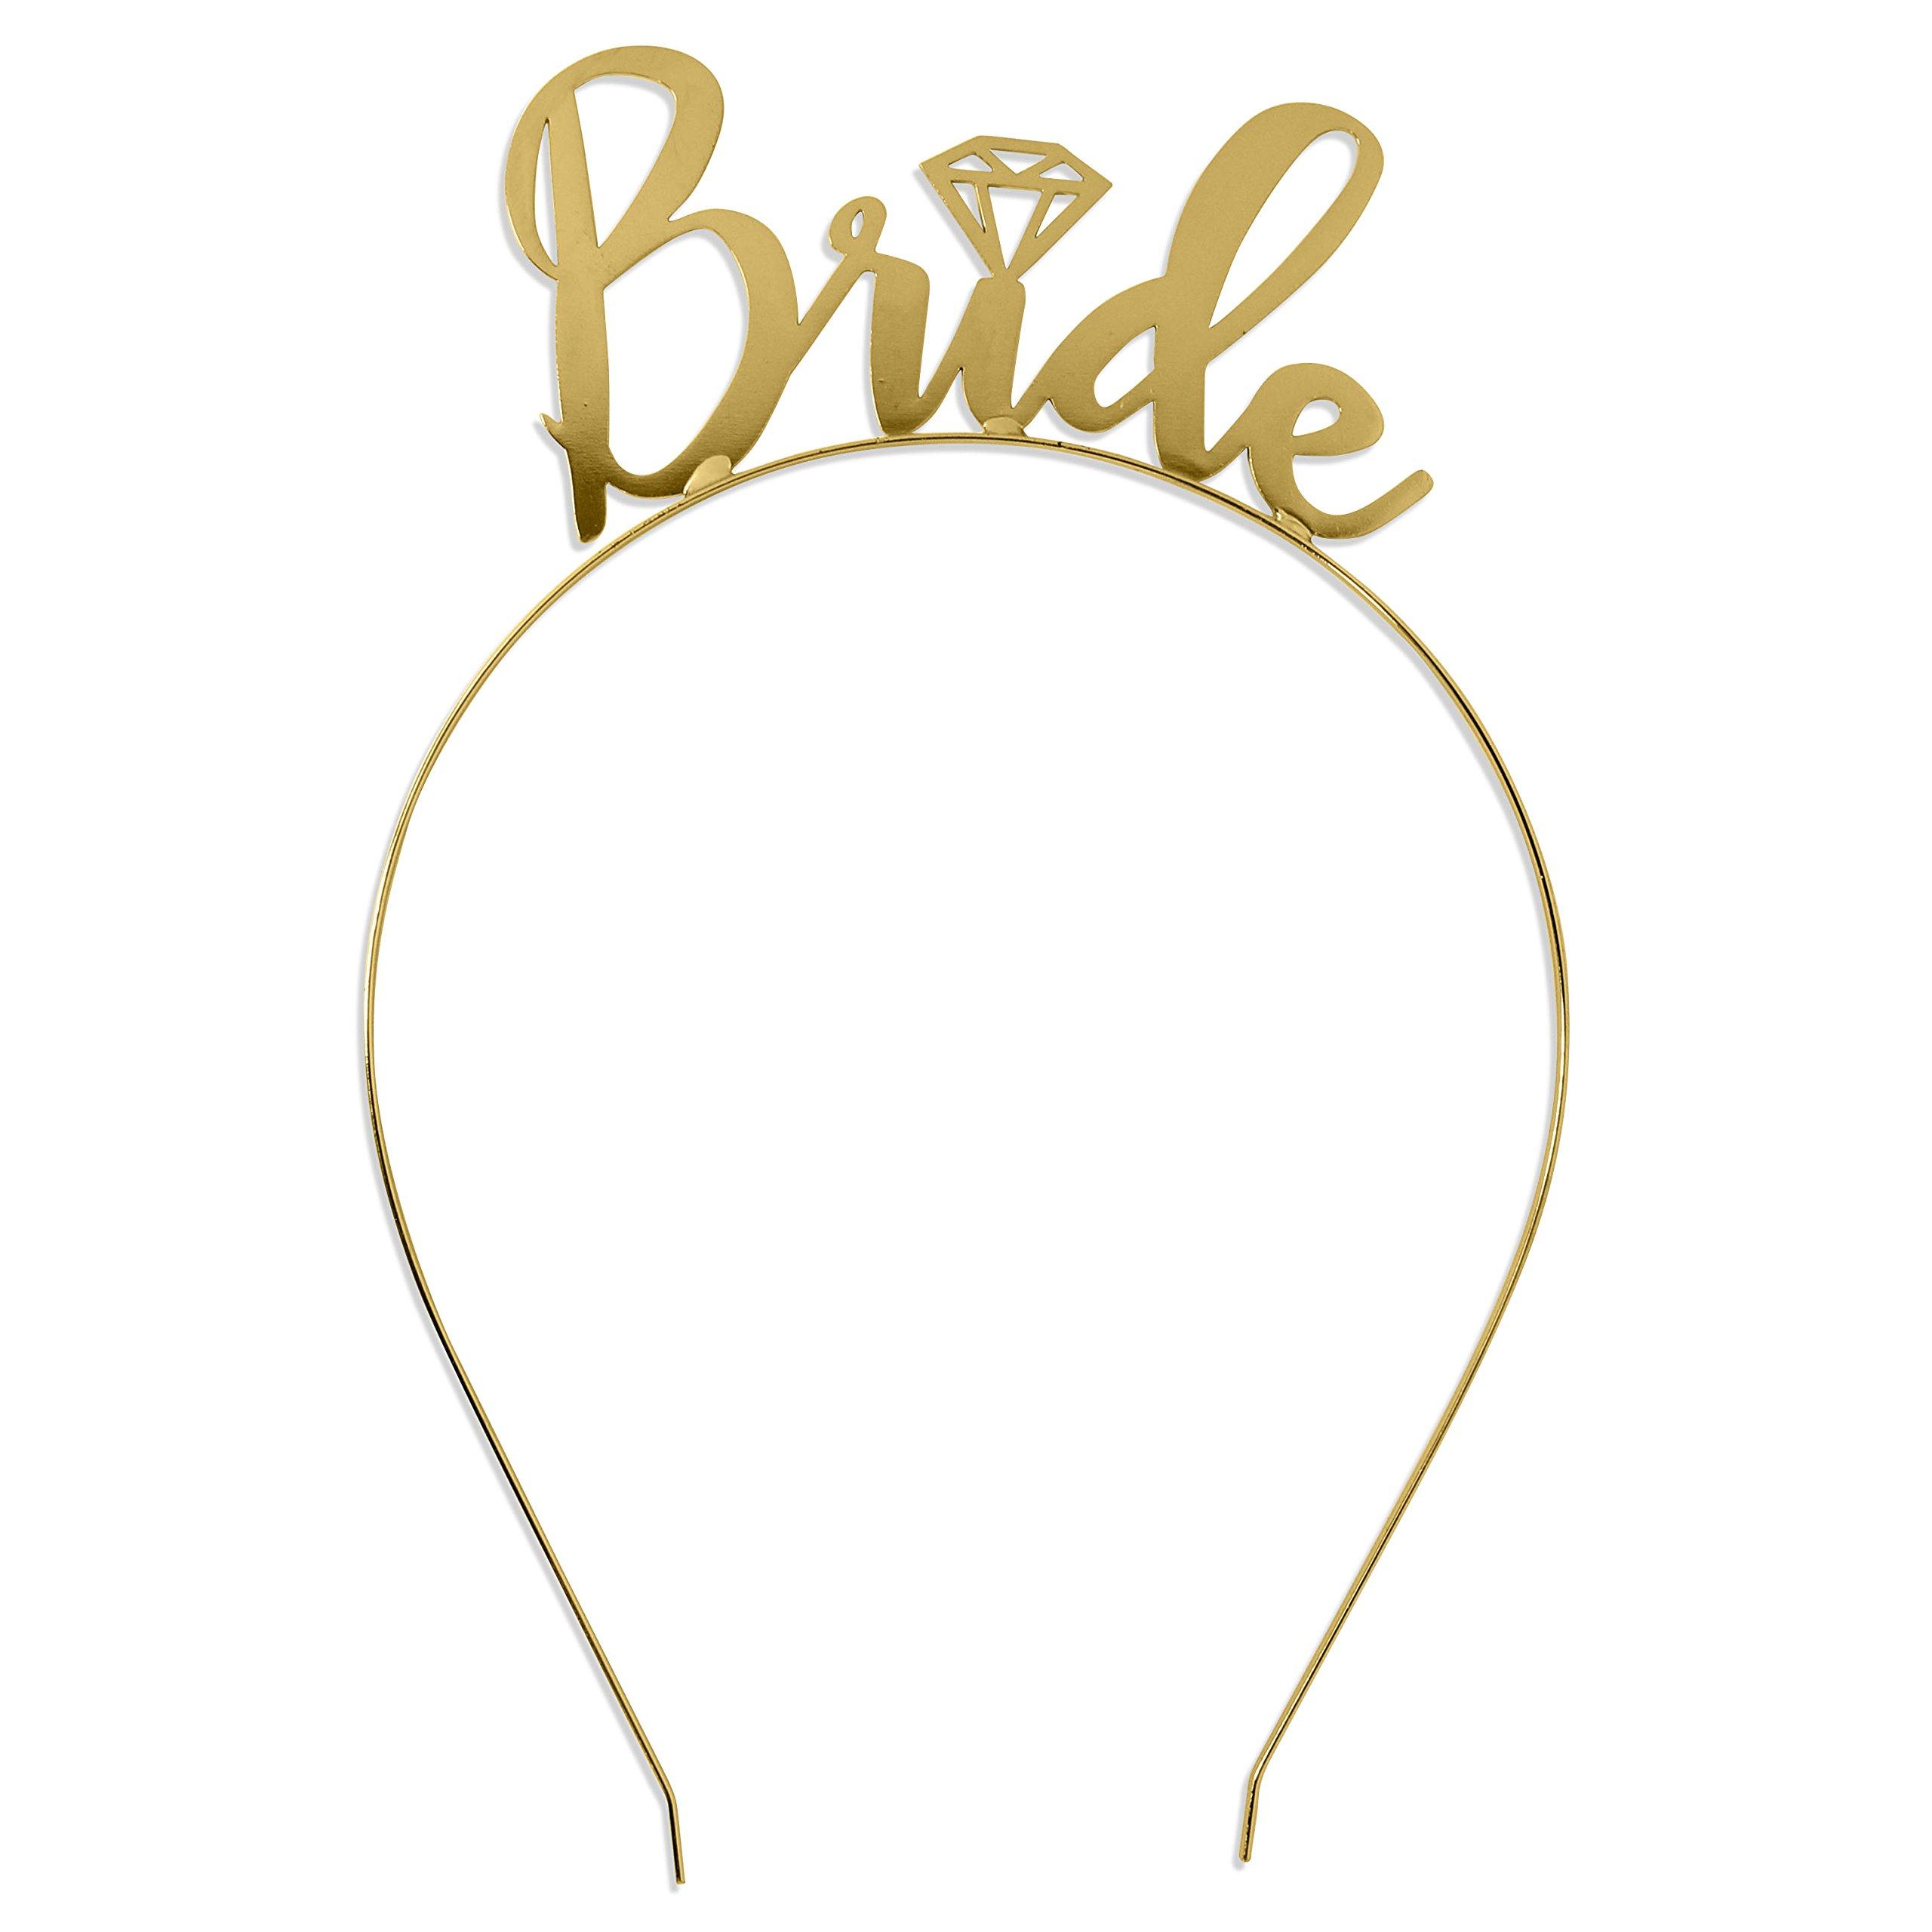 Bride Headband Bachelorette Party Gold - Bridal Shower Tiara Headband HdBd(Bride) GLD